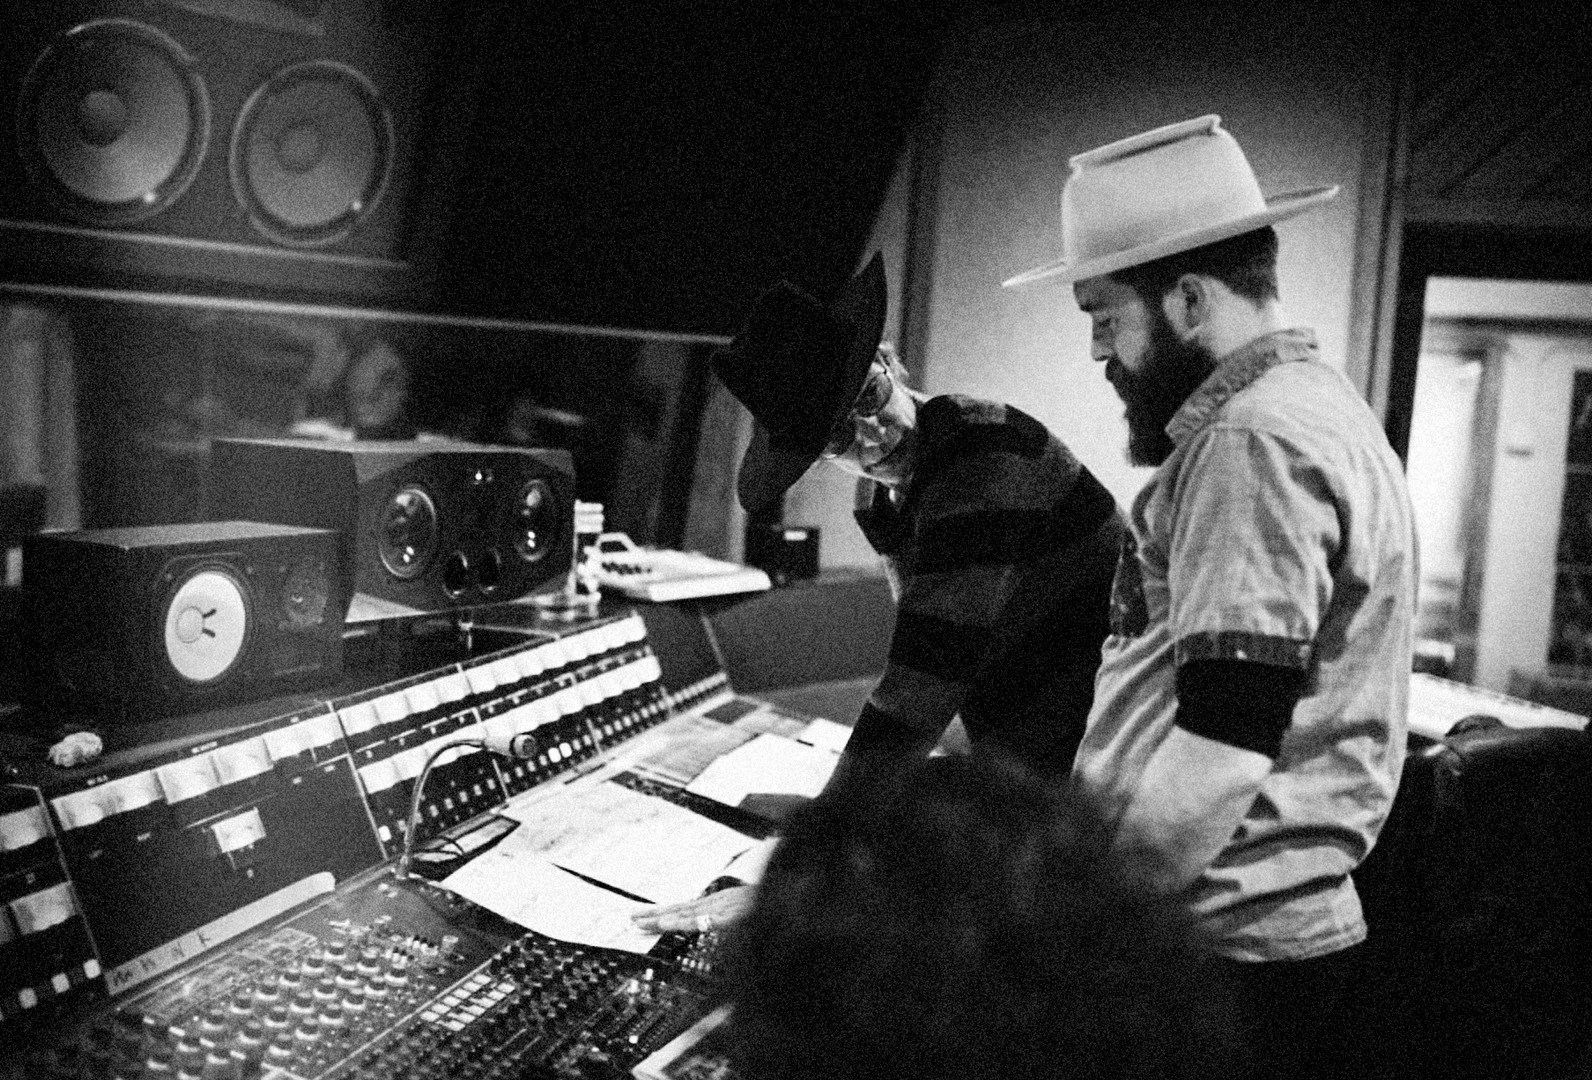 studio.shot.chsrlie.jpg